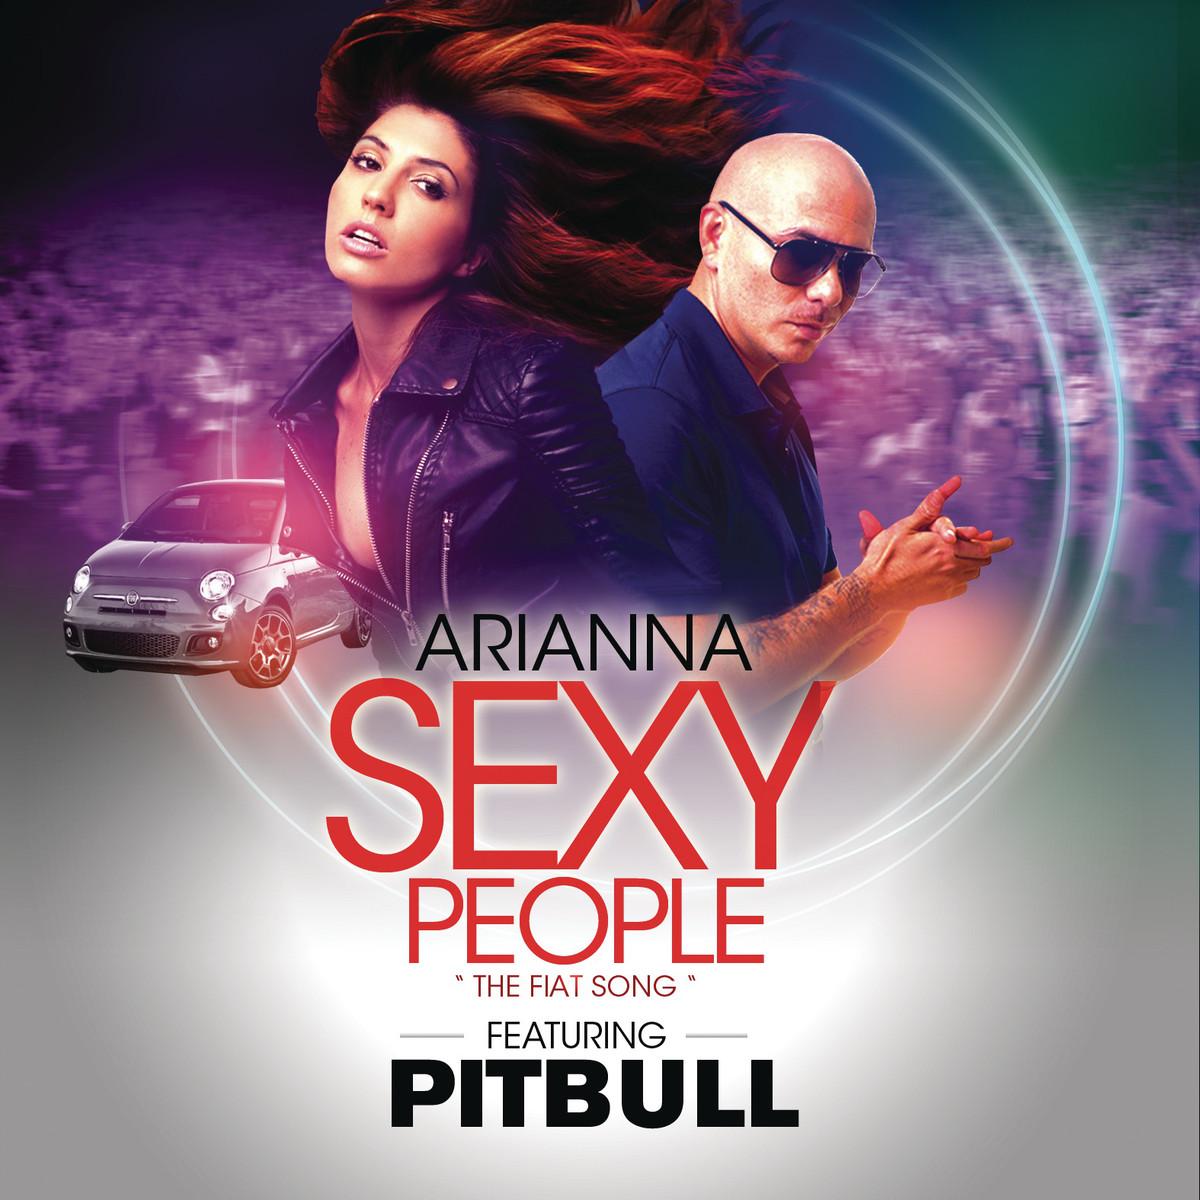 Arianna fr Pitbull sexy people